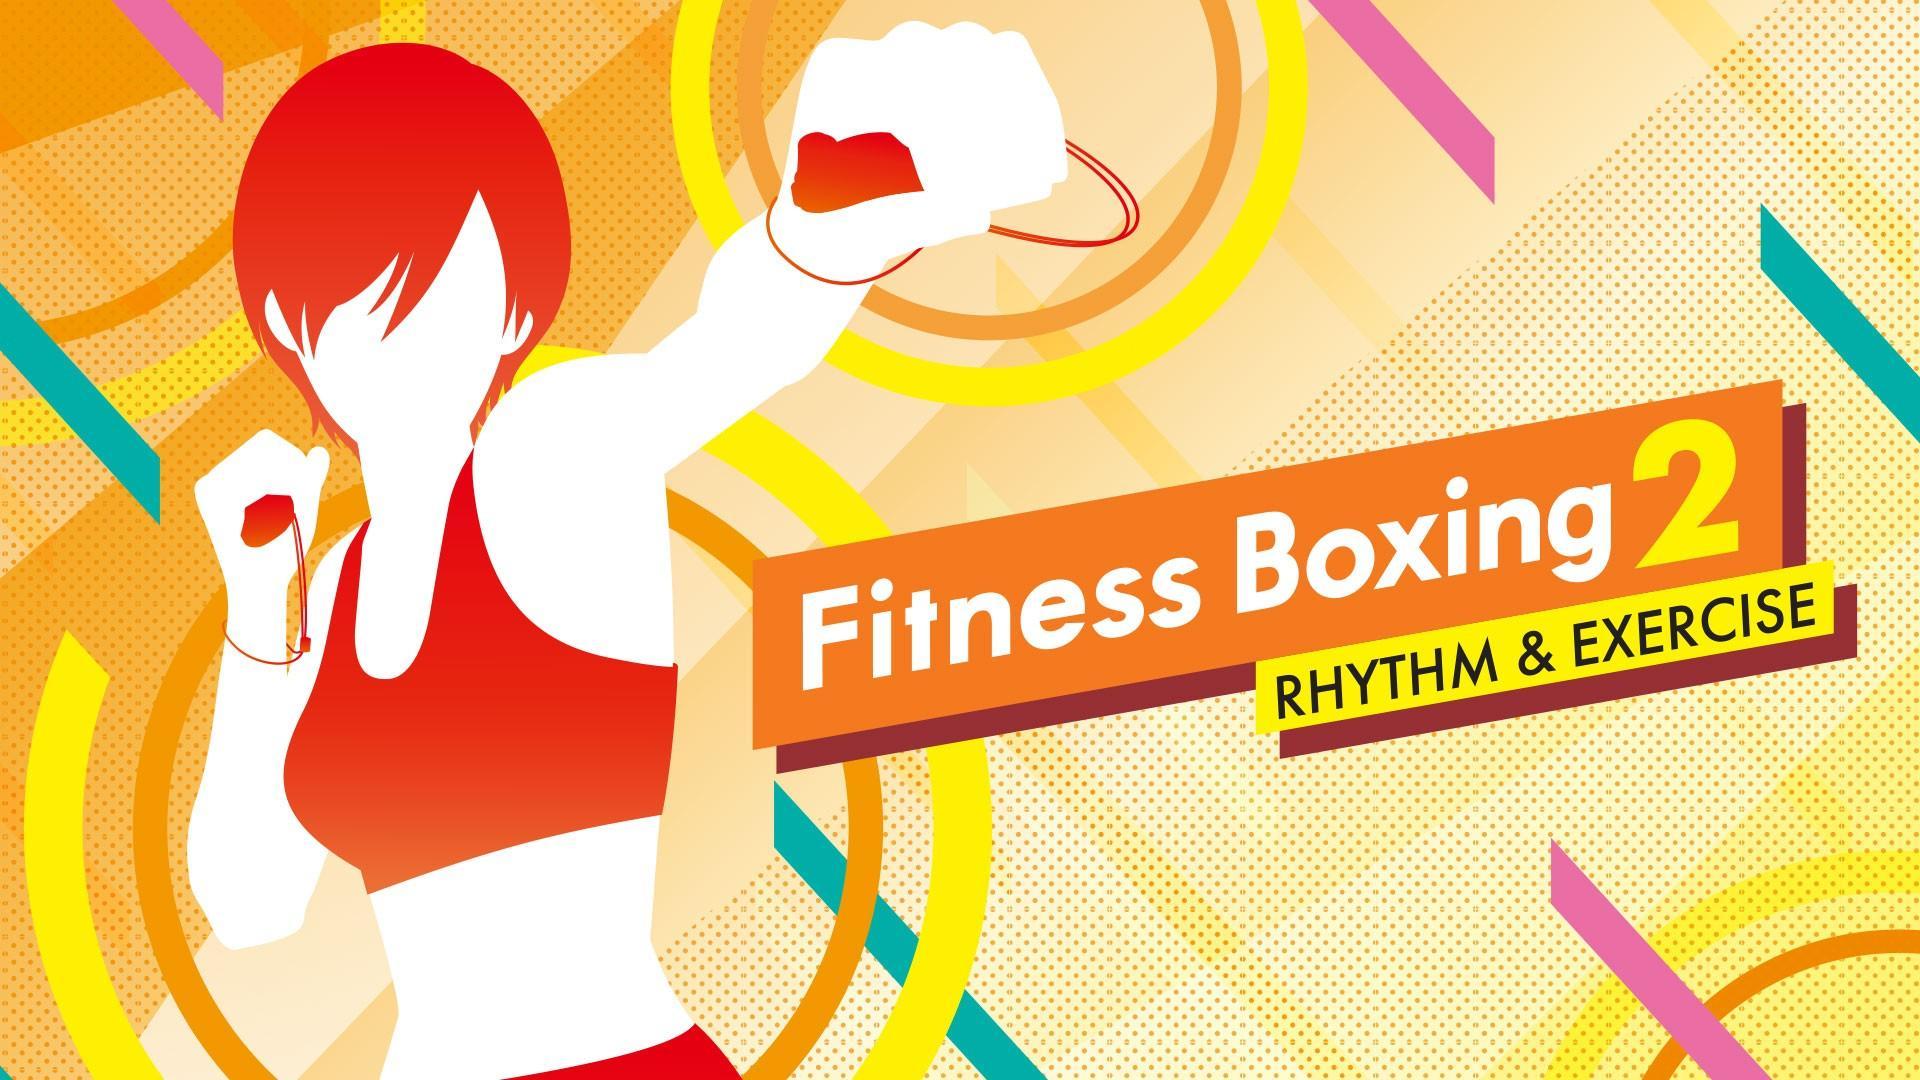 В eShop стала доступна демоверсия Fitness Boxing 2: Rhythm & Exercise 2